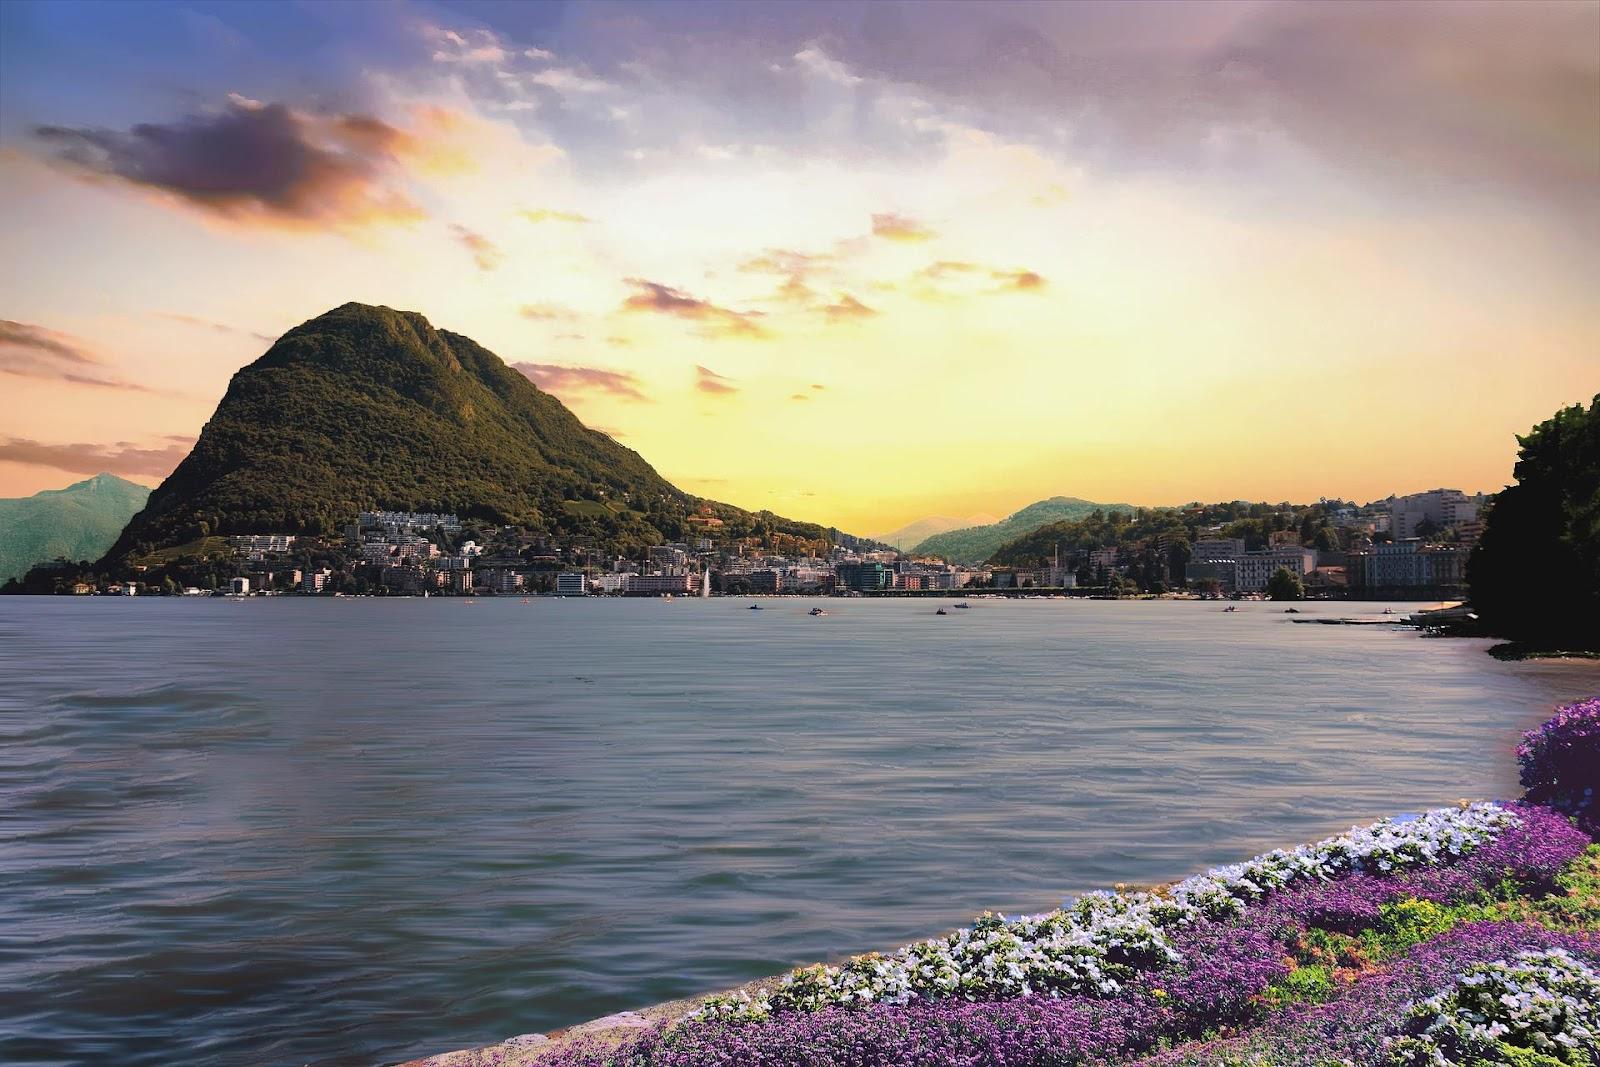 lake lugano large mountain flowers calm lake colorful sunset switzerland